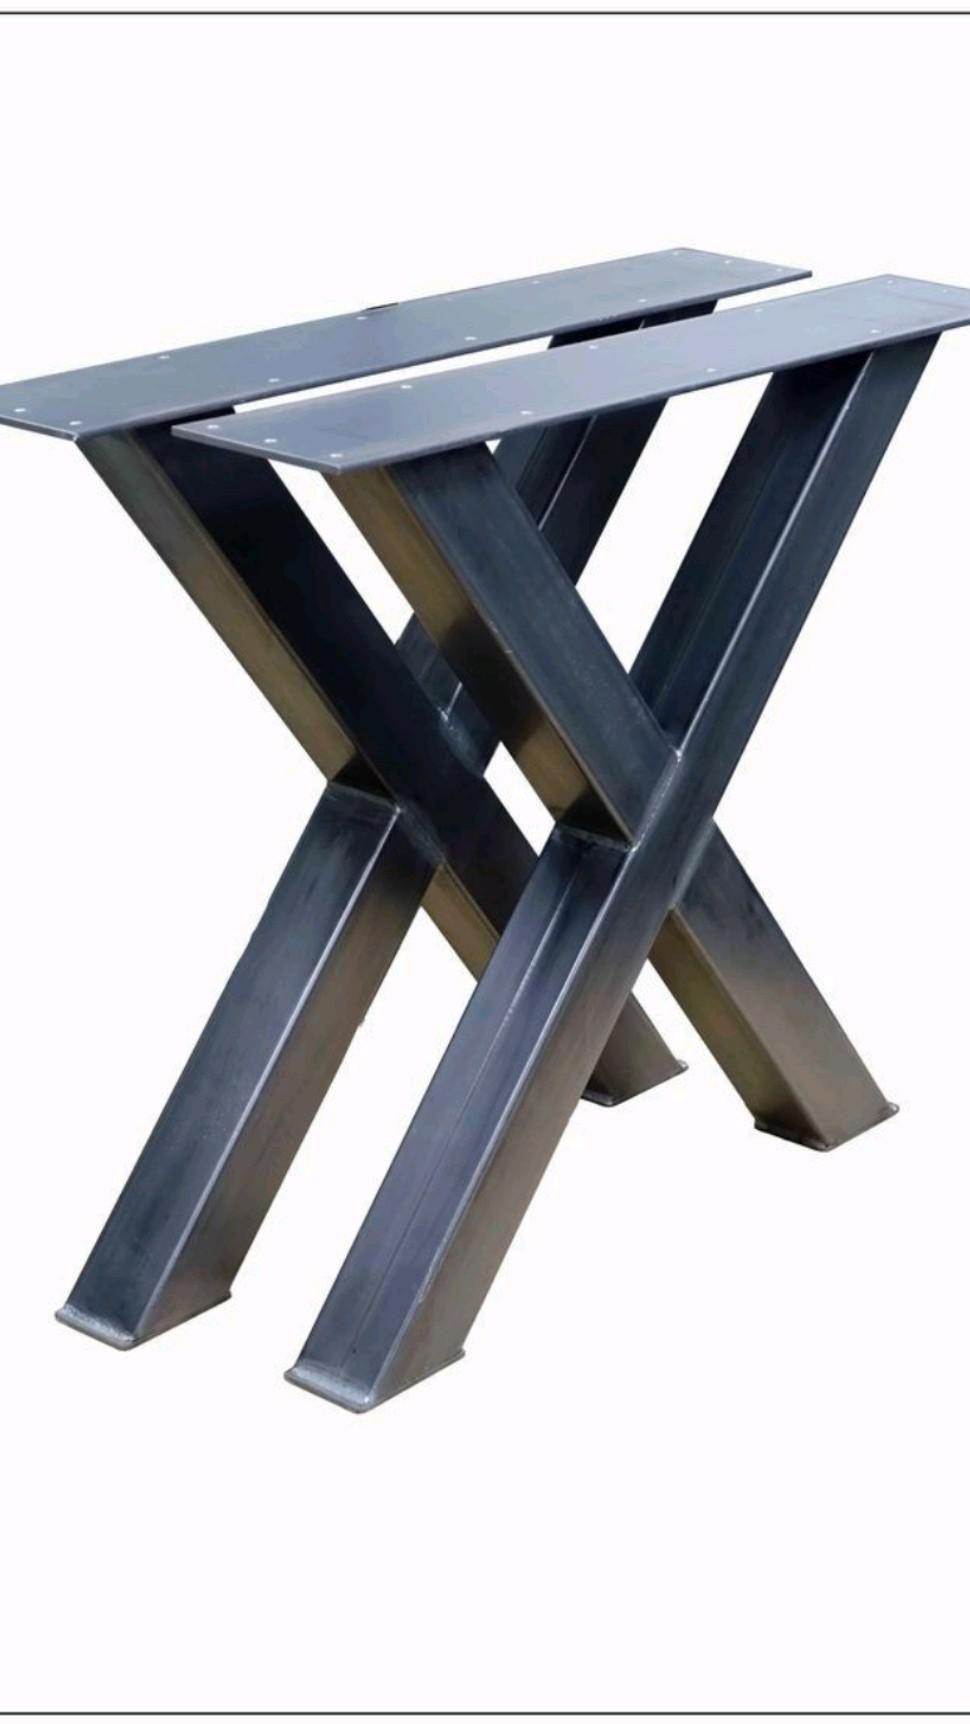 Stahl Tischkufen